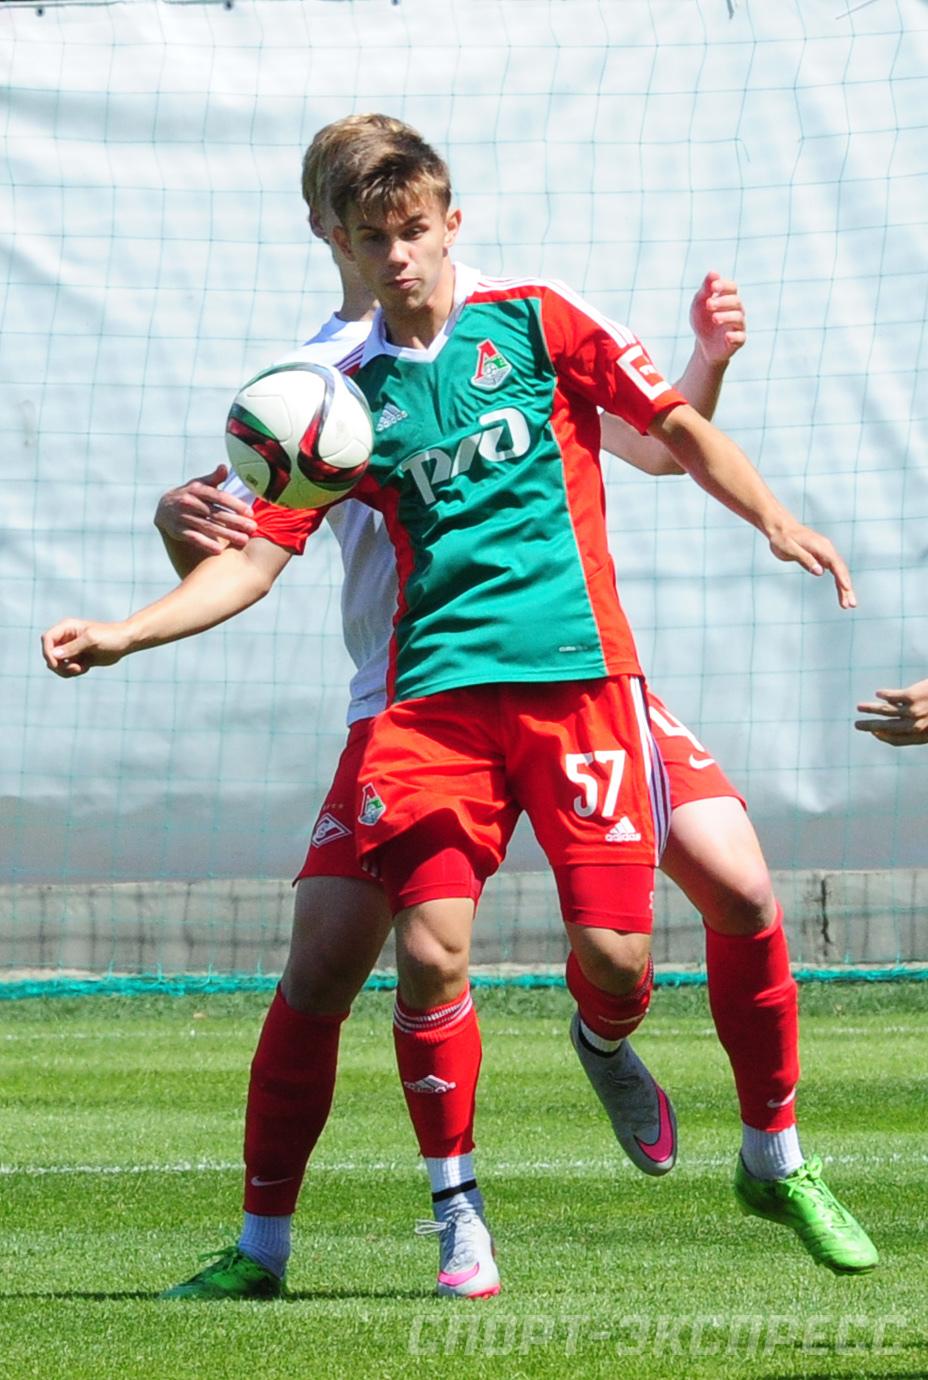 Вольфсбург проявляет интерес к Базуру — Kicker